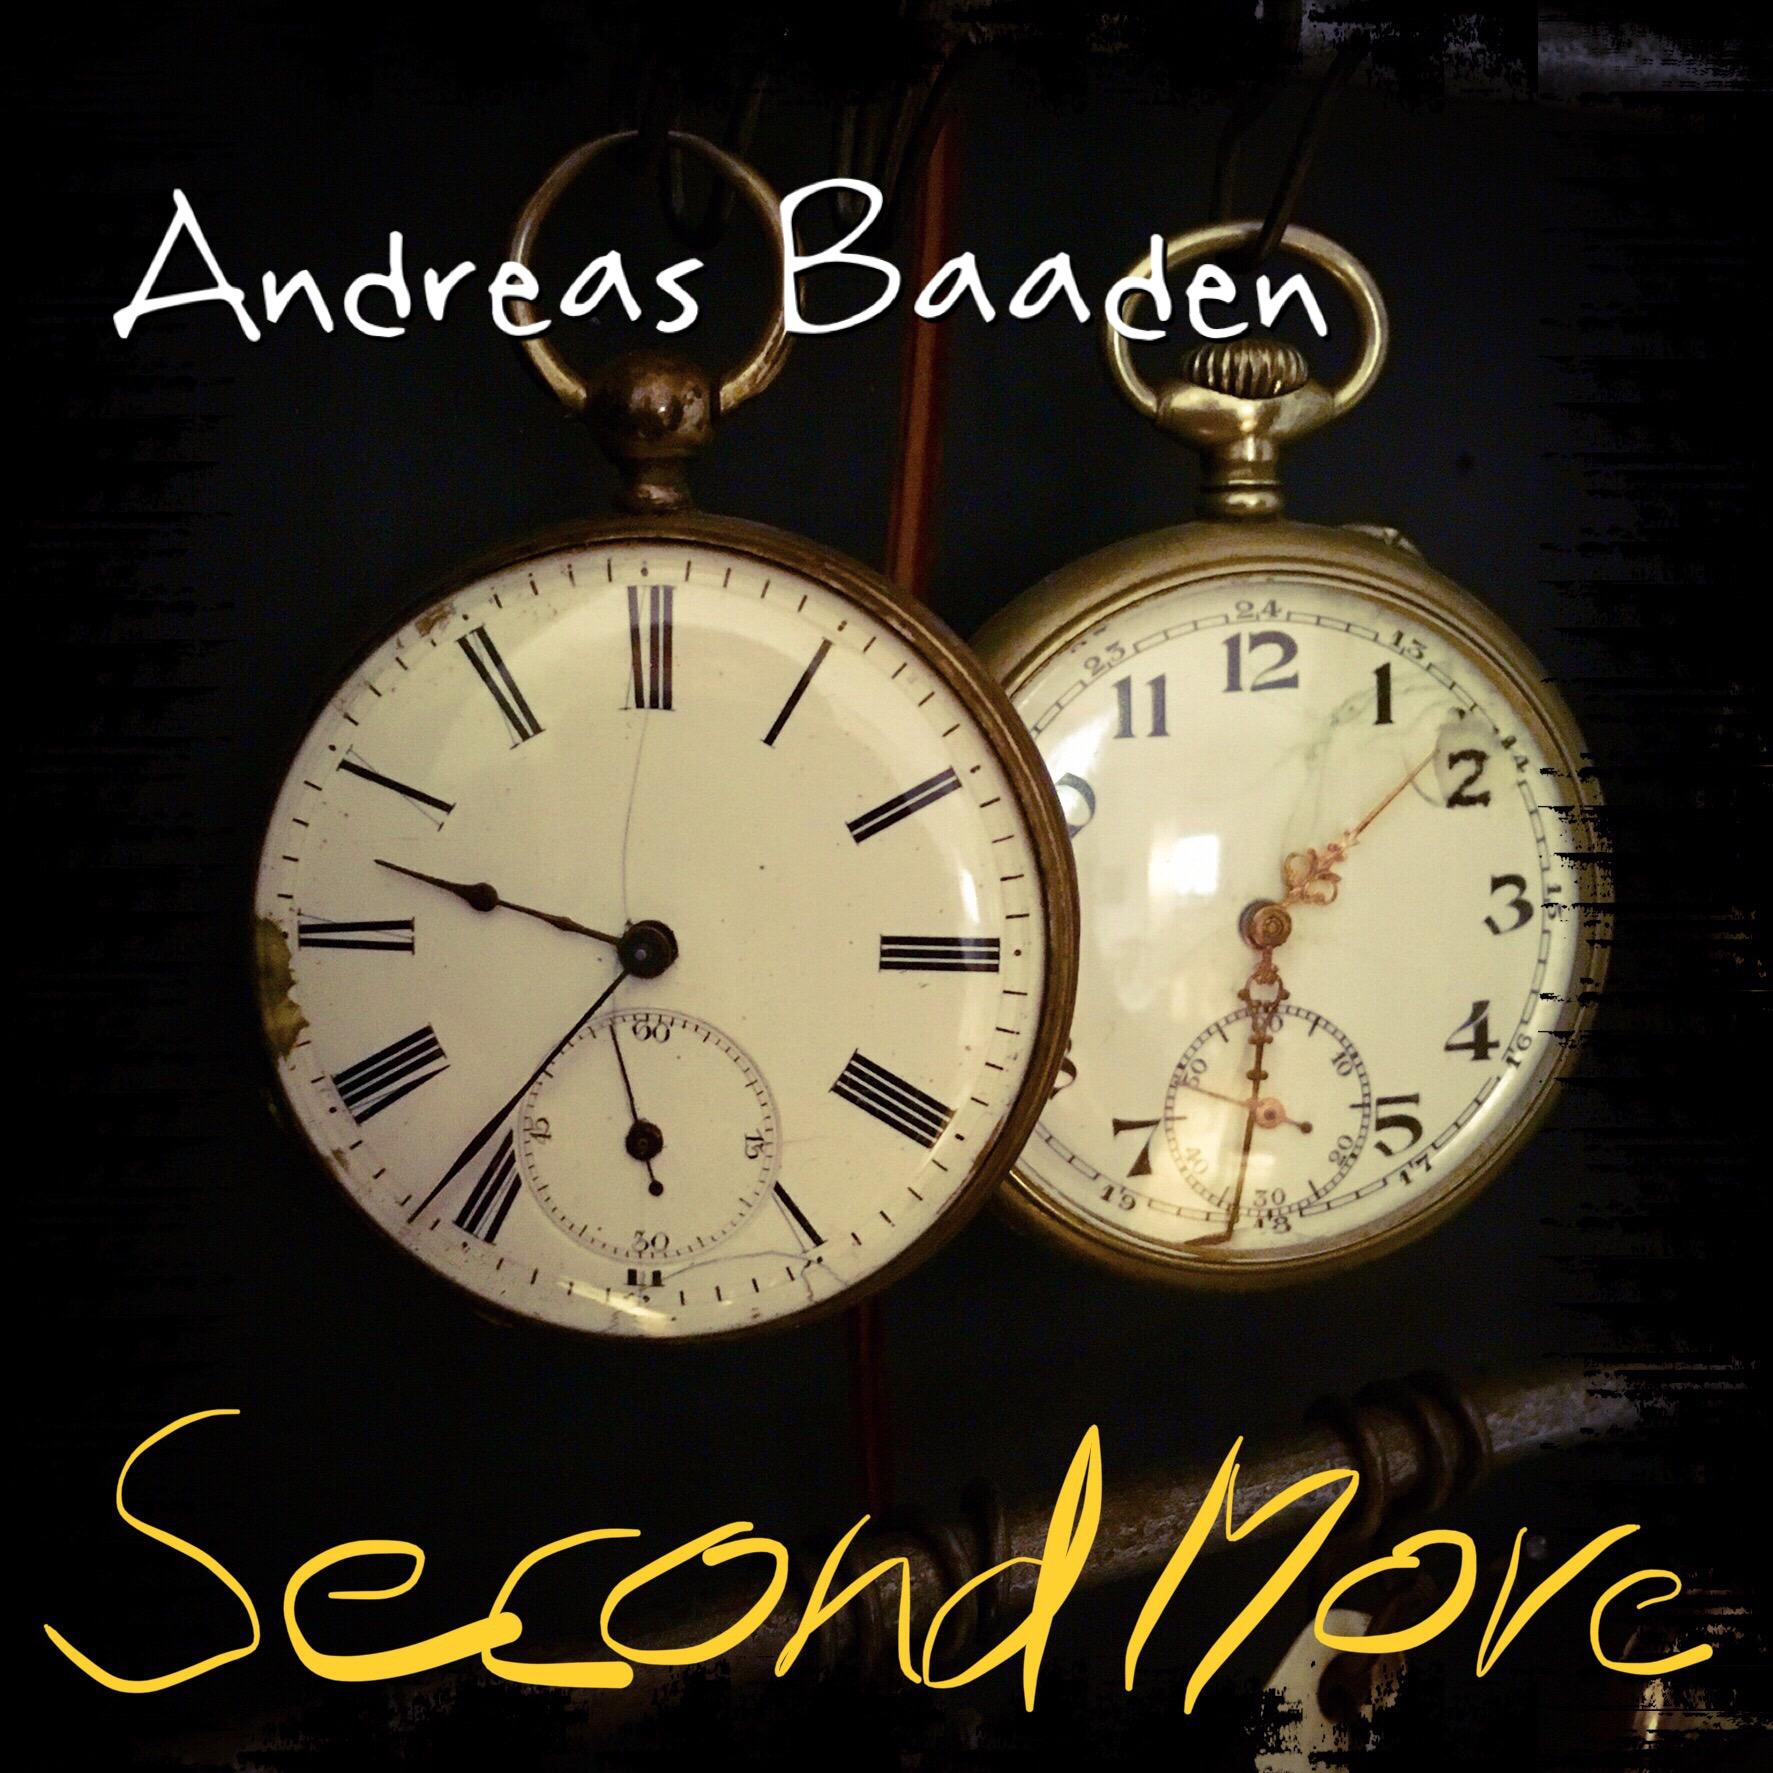 Second Move - Andreas Baaden